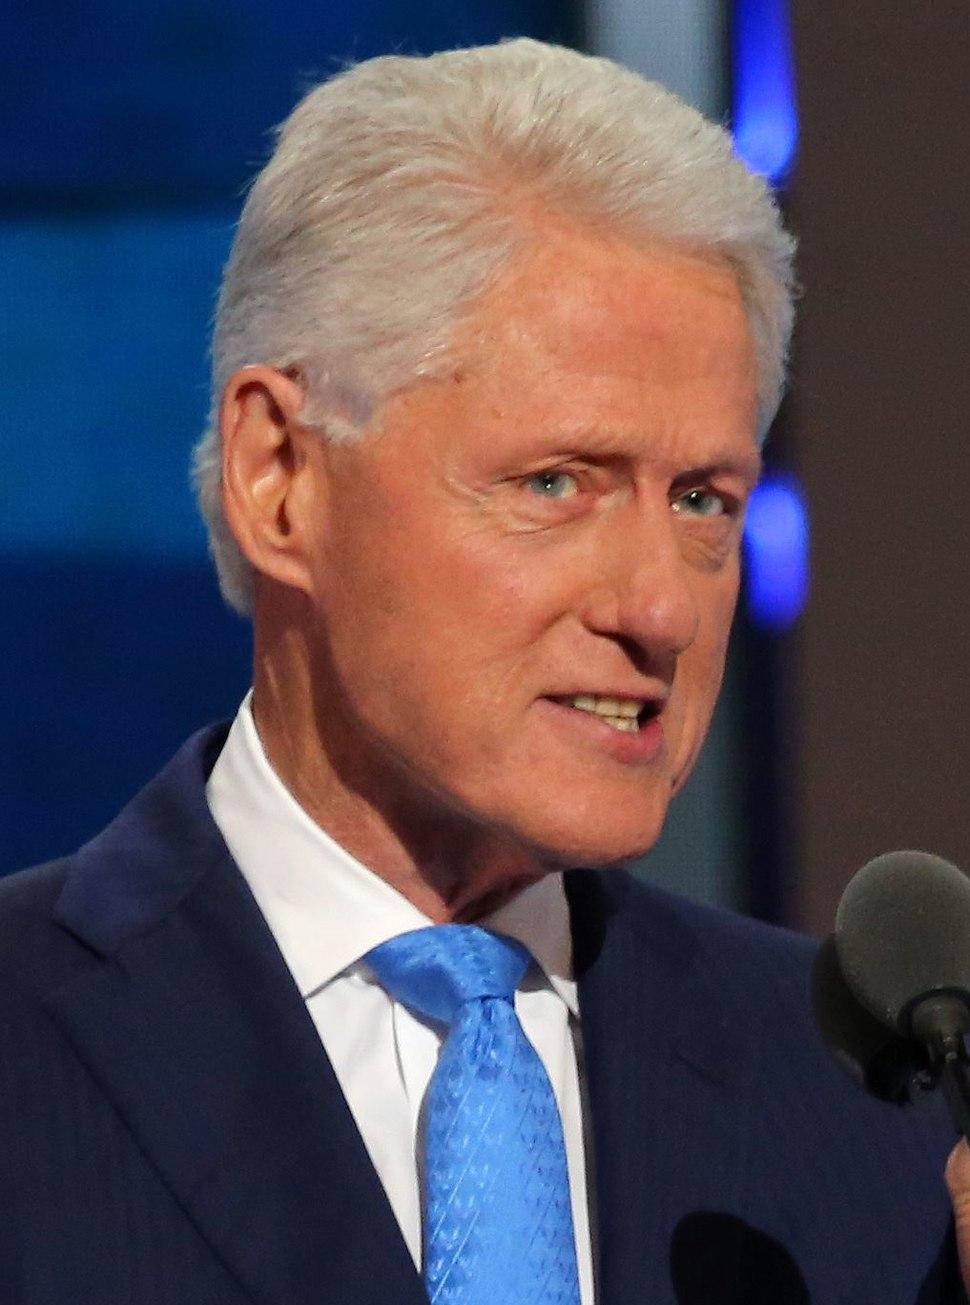 Bill Clinton DNC July 2016 (cropped)